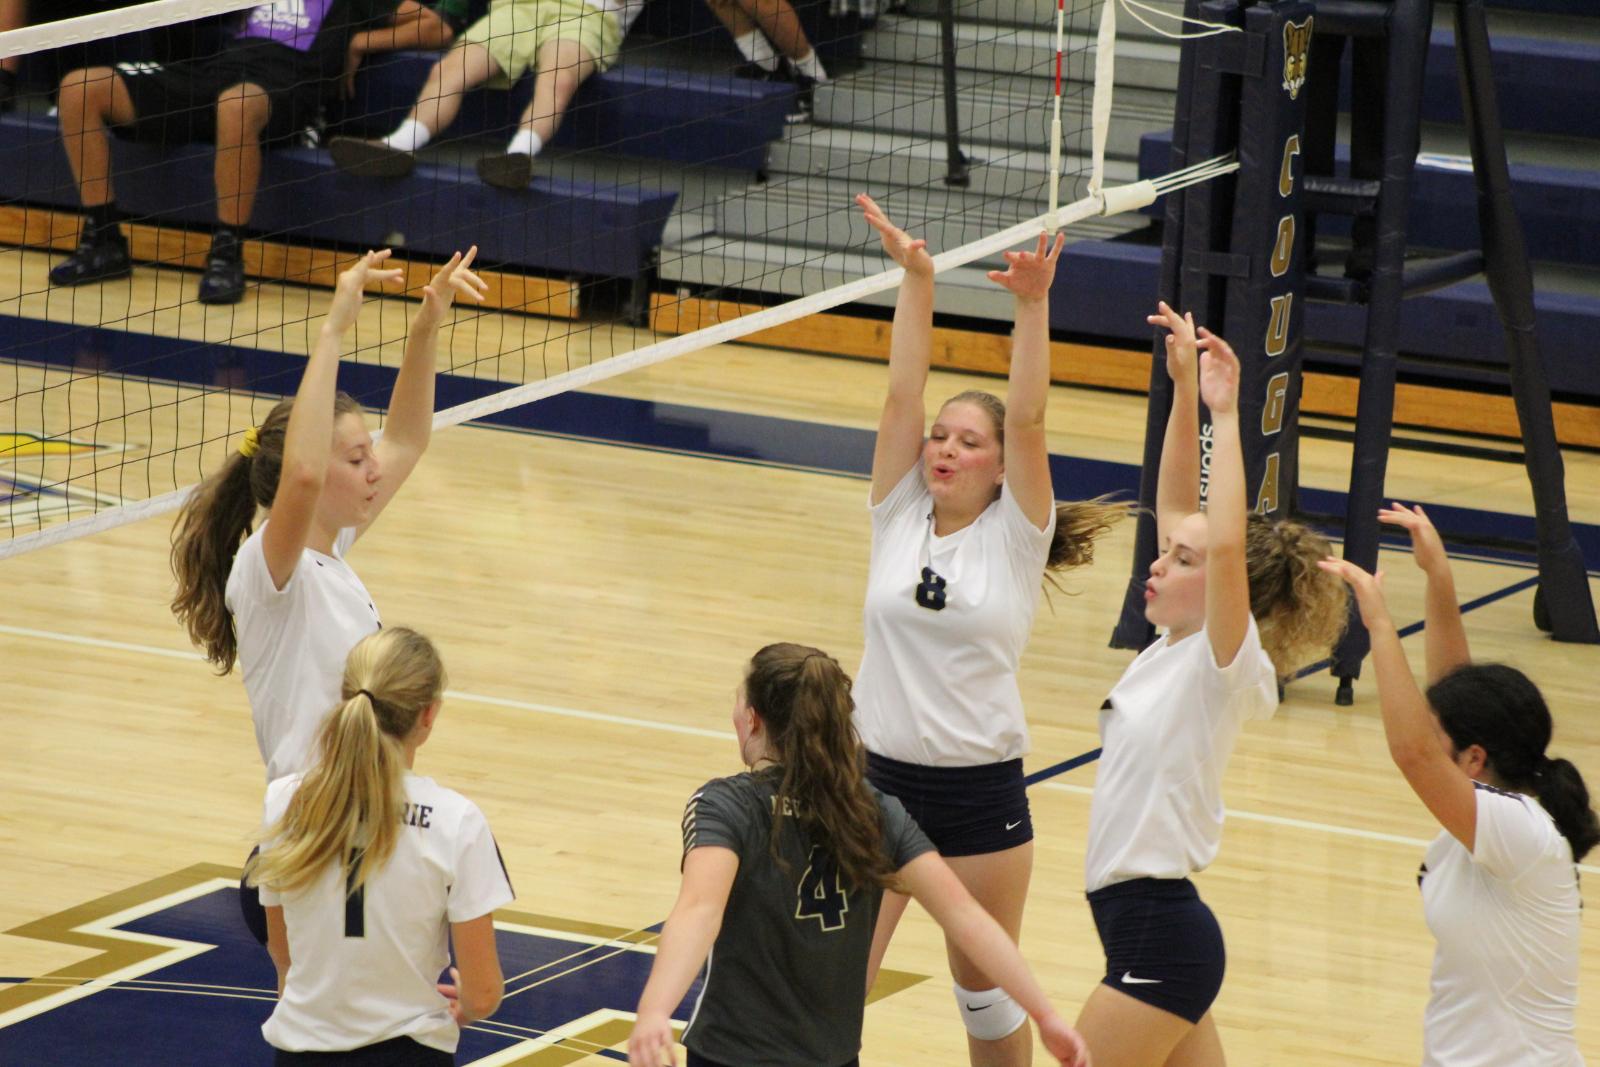 JV  Volleyball vs. SB St. Joseph  9/1/20 (Photo Gallery)